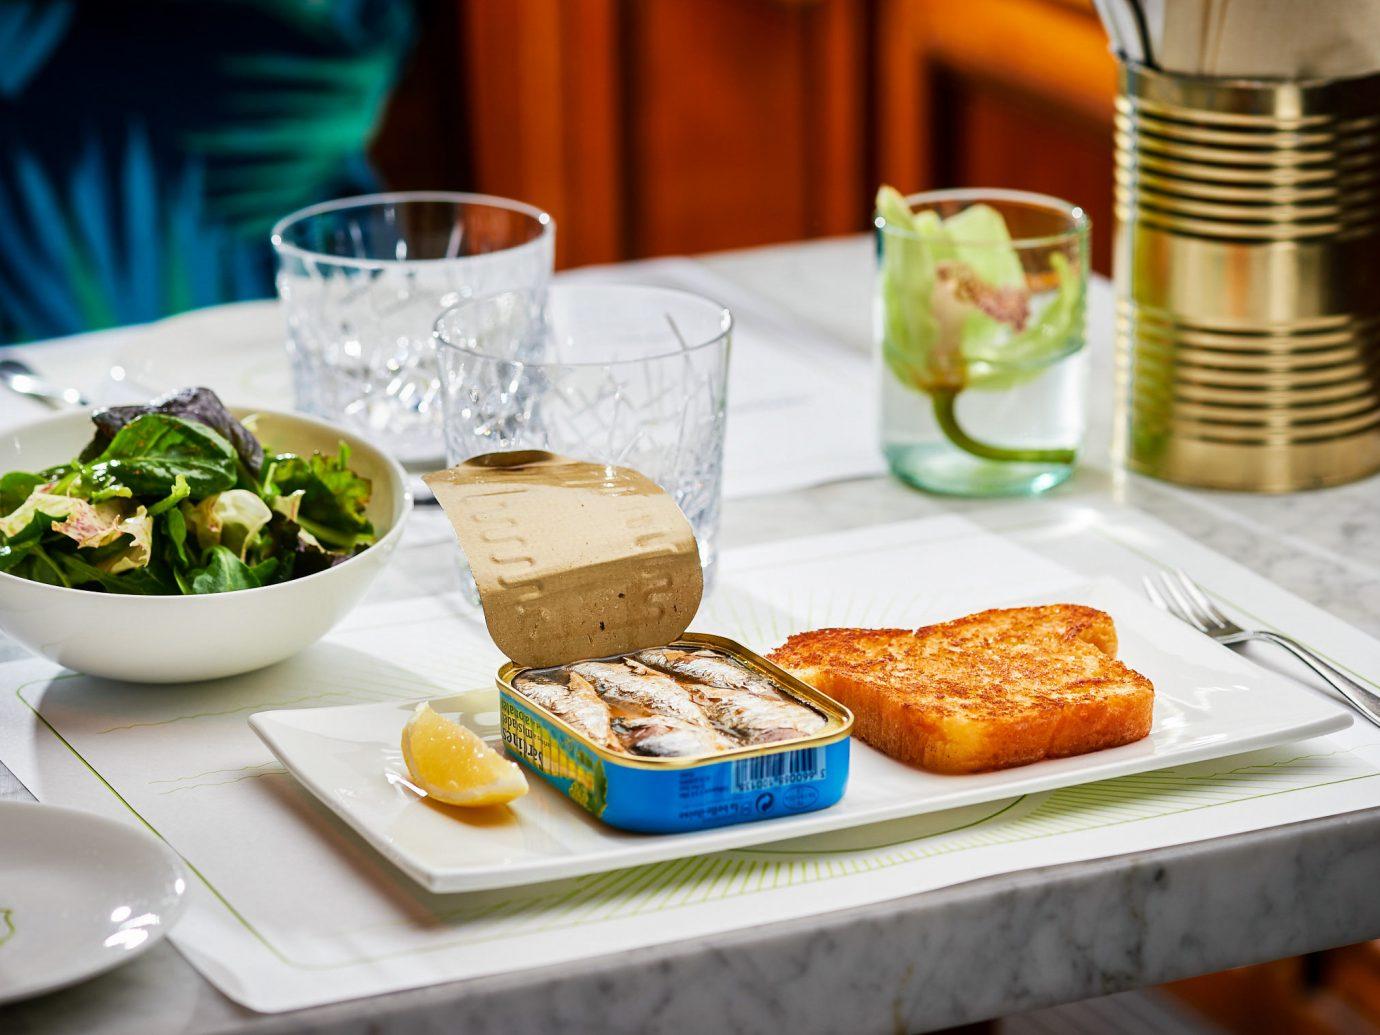 Trip Ideas table food plate meal indoor dish brunch breakfast cuisine lunch vegetarian food appetizer finger food full breakfast recipe